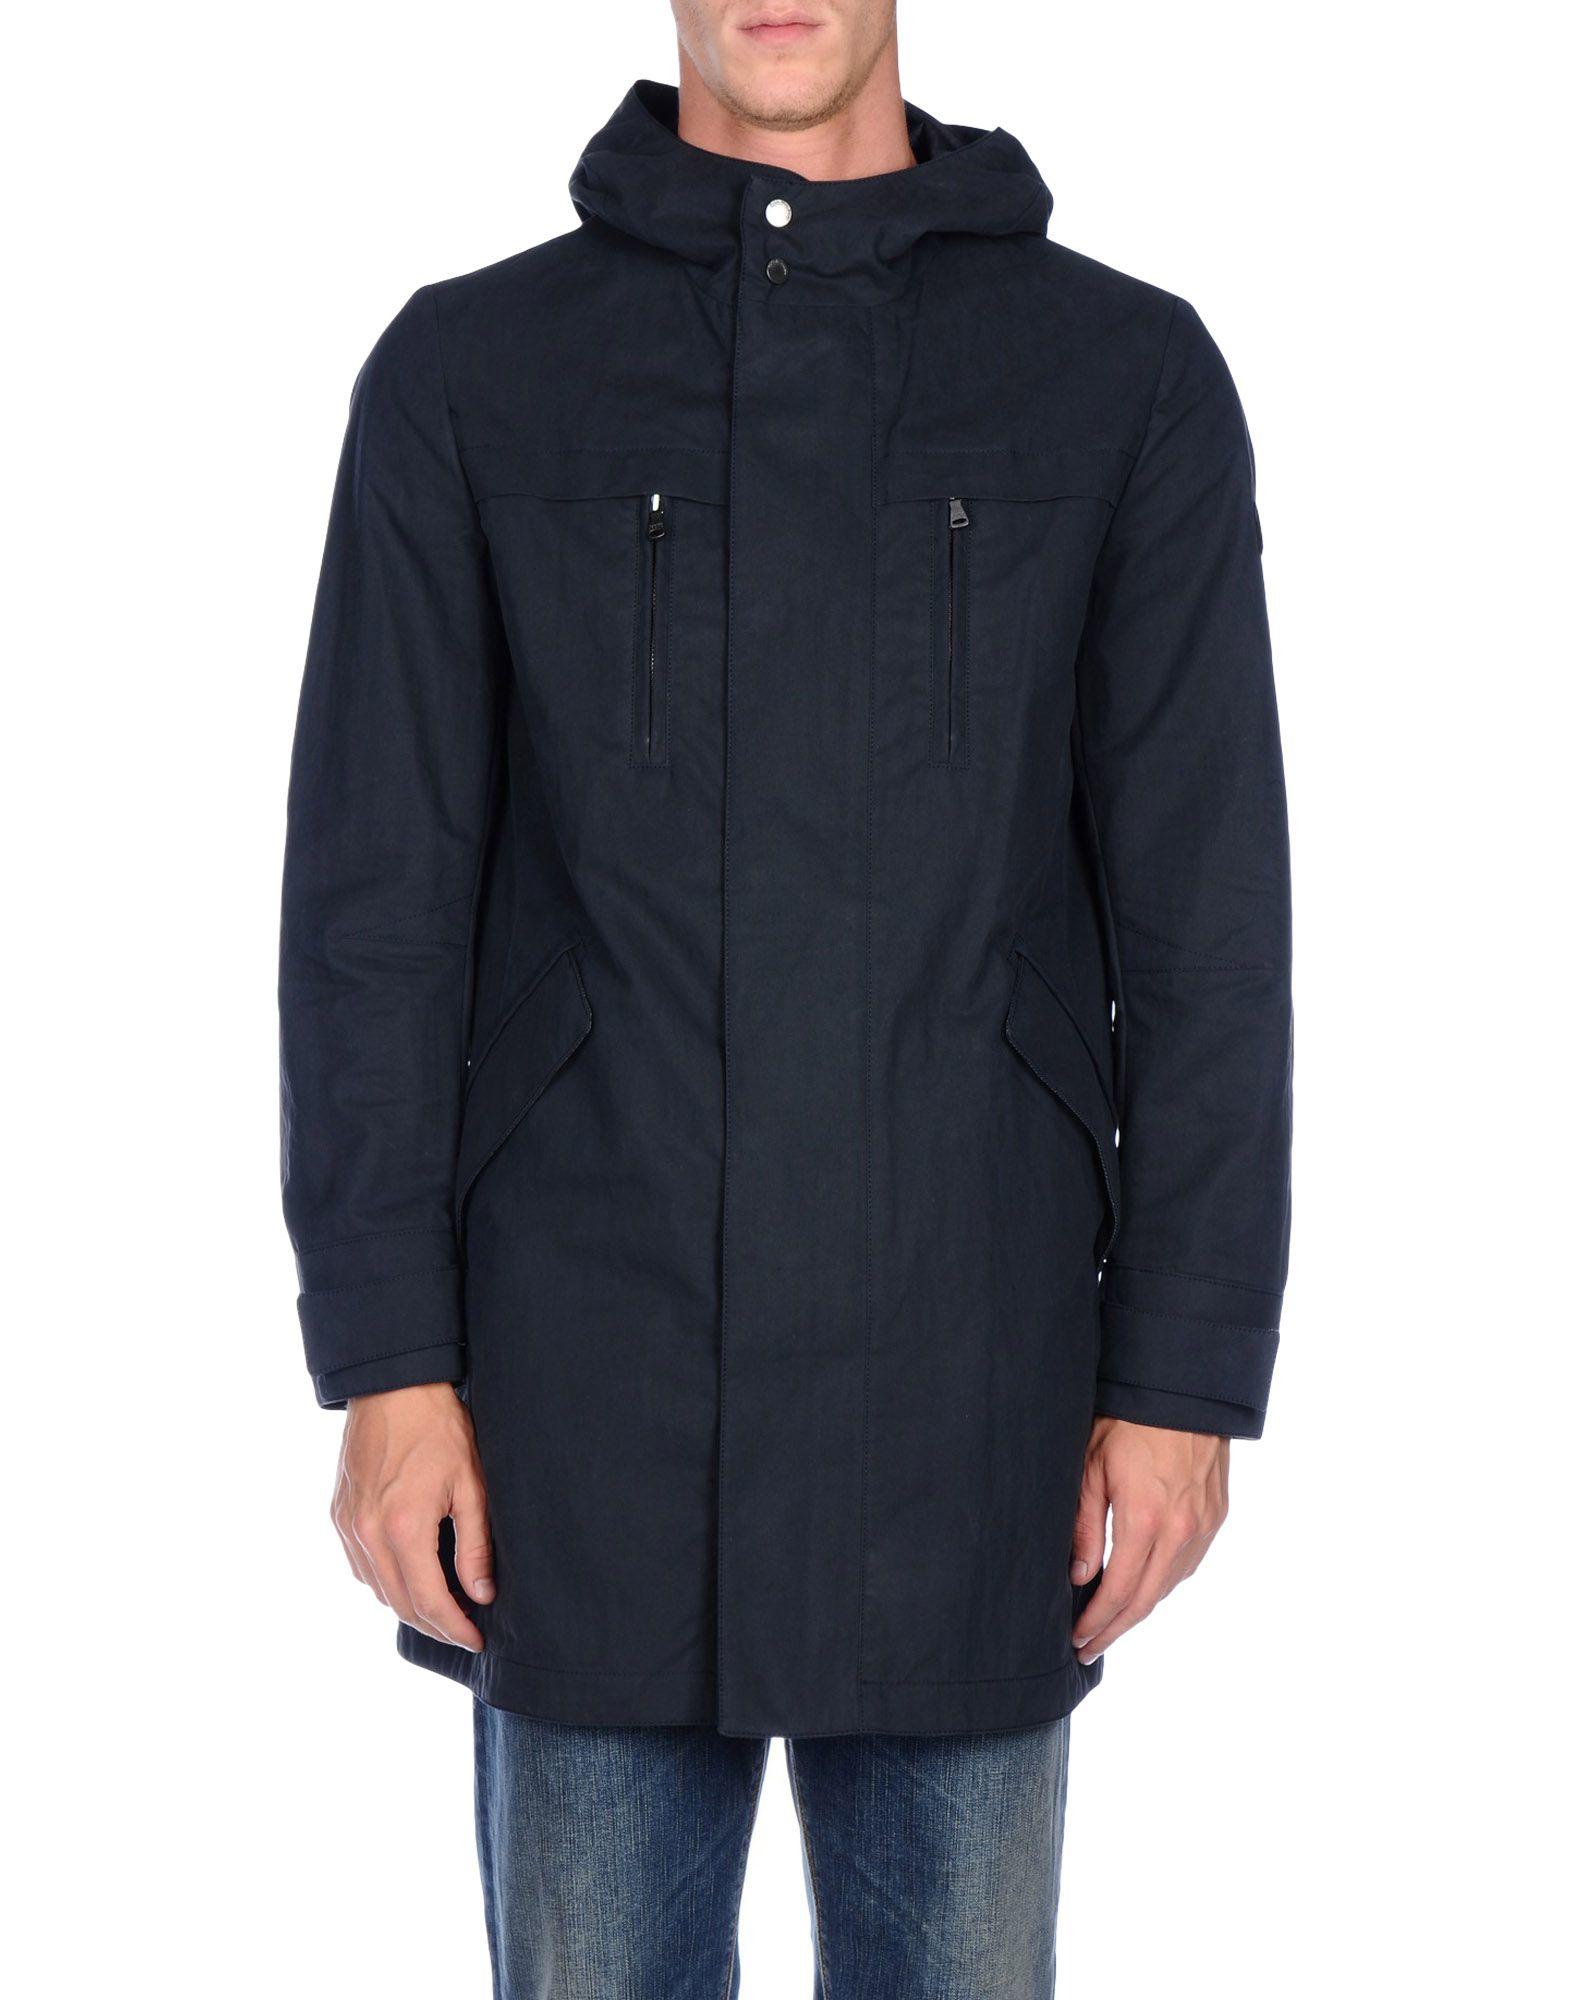 Lyst - Calvin Klein Jeans Jacket in Blue for Men